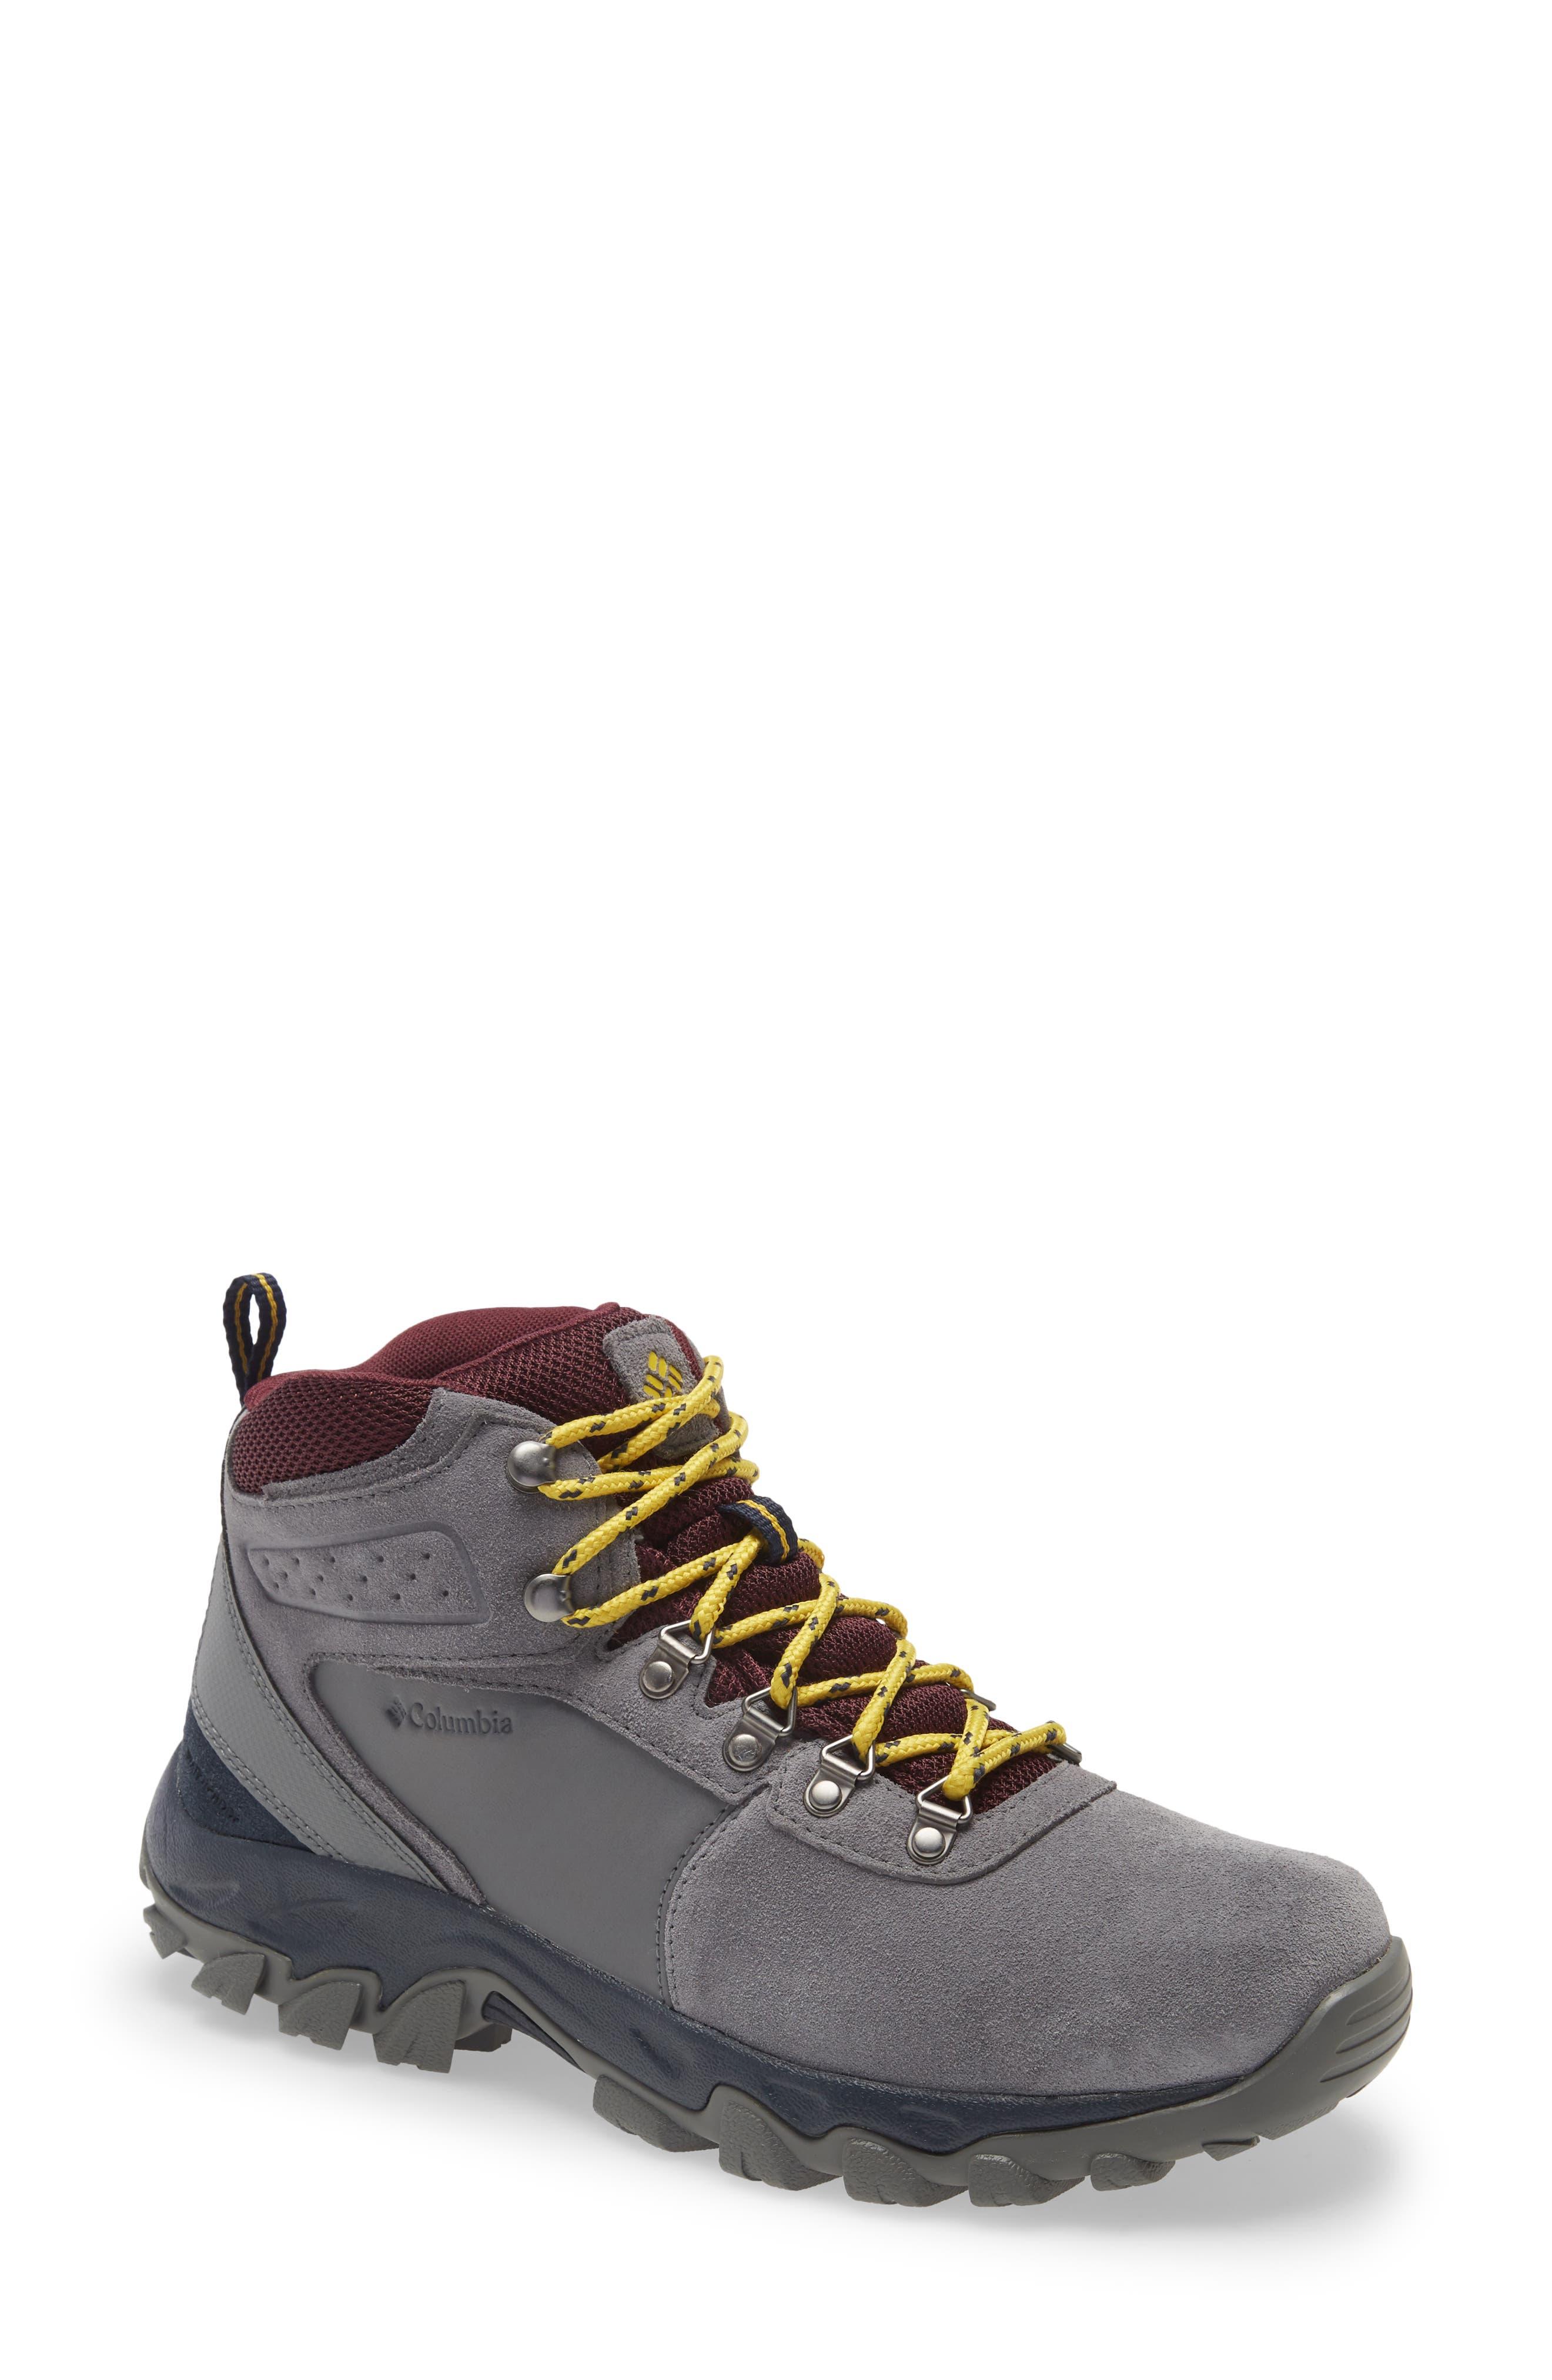 Newton Ridge(TM) Plus Ii Waterproof Hiking Boot